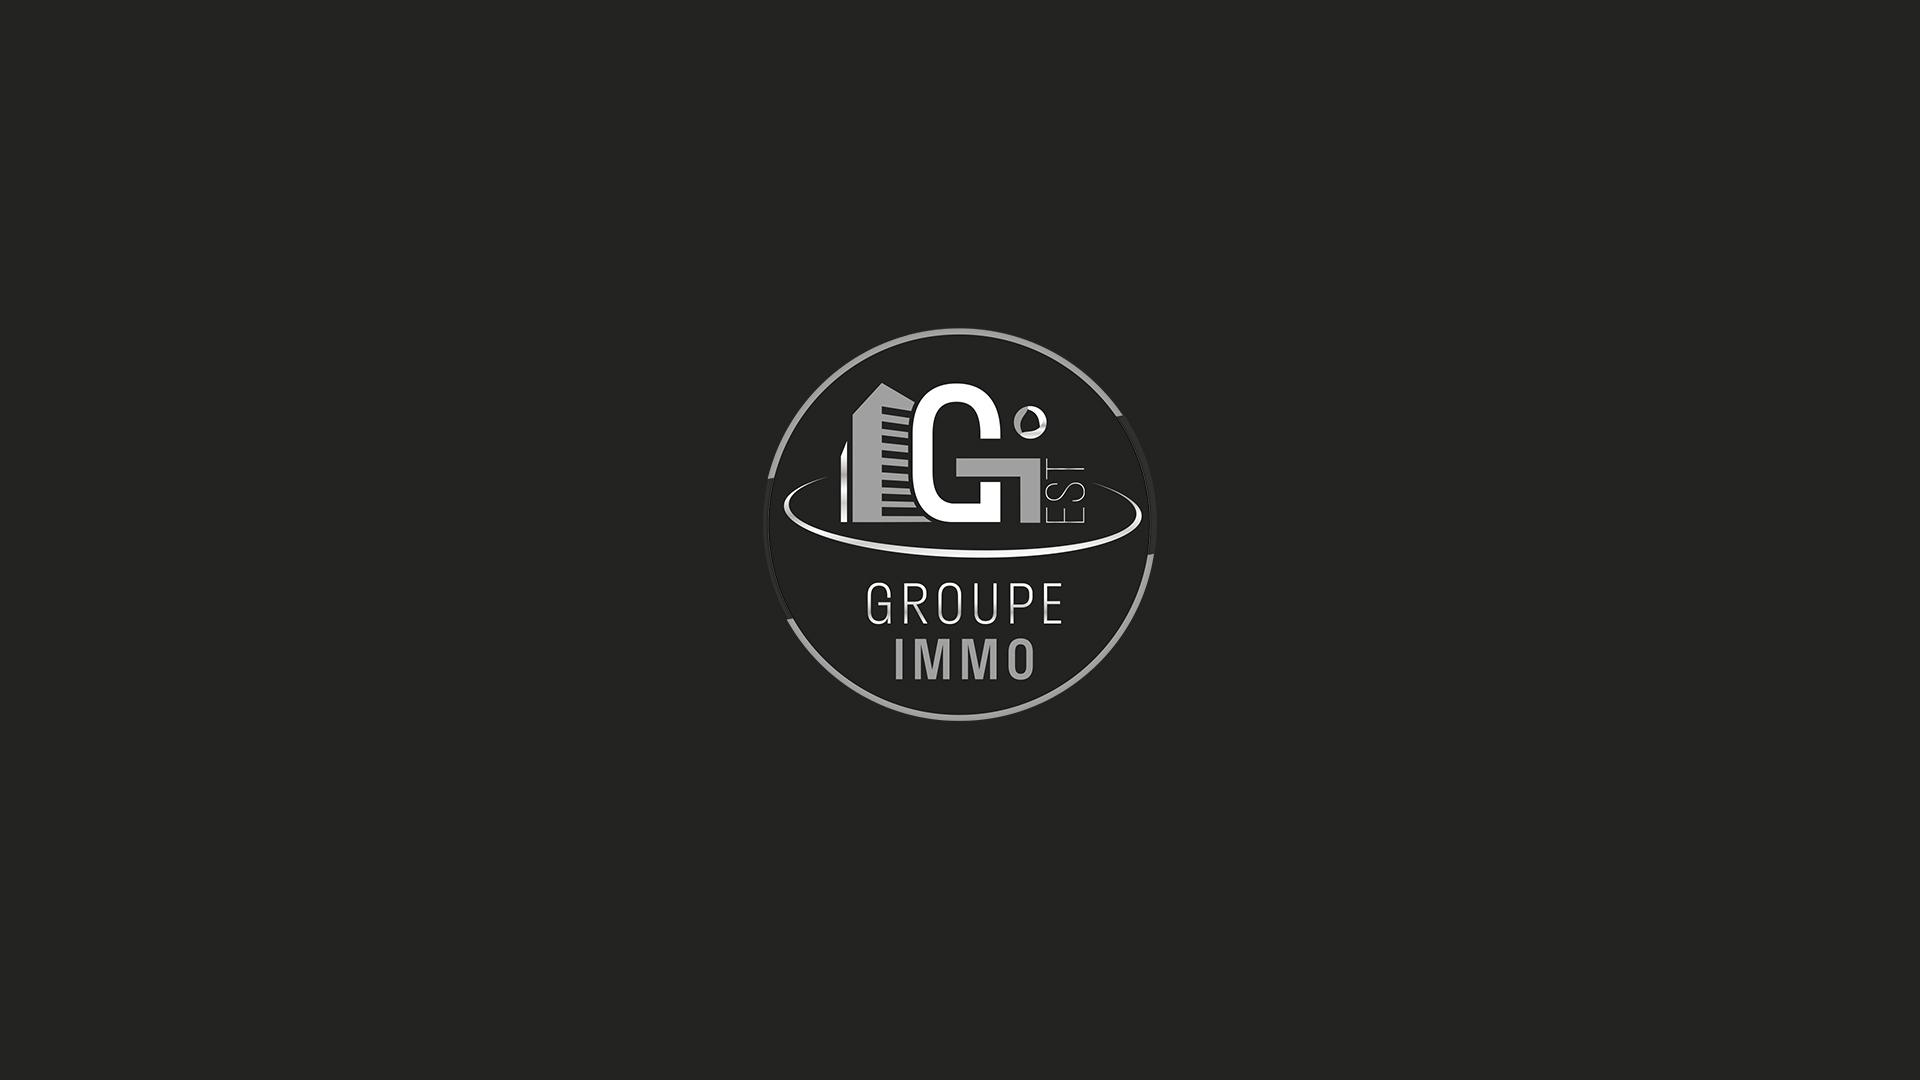 logo groupe immo est